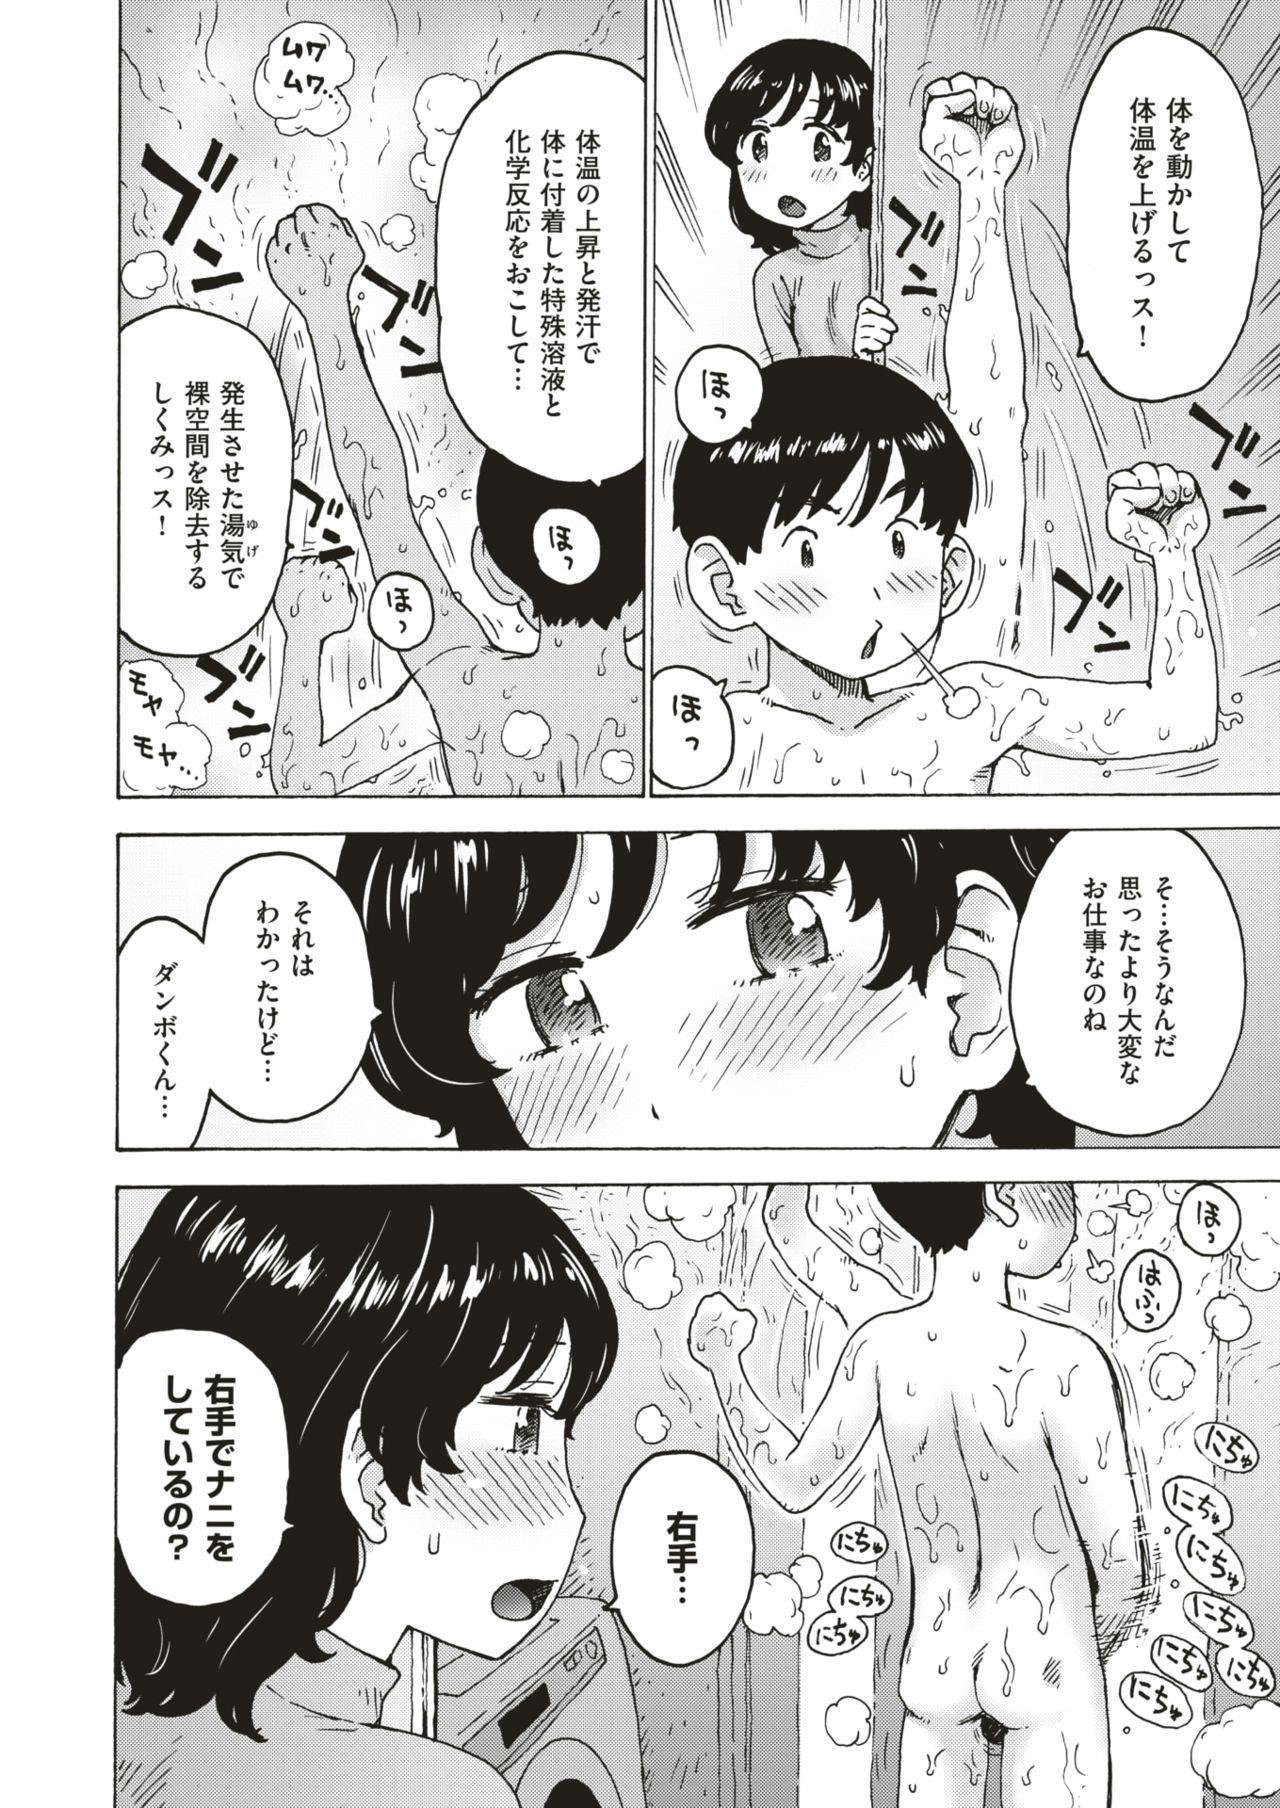 COMIC HAPPINING Vol. 4 40